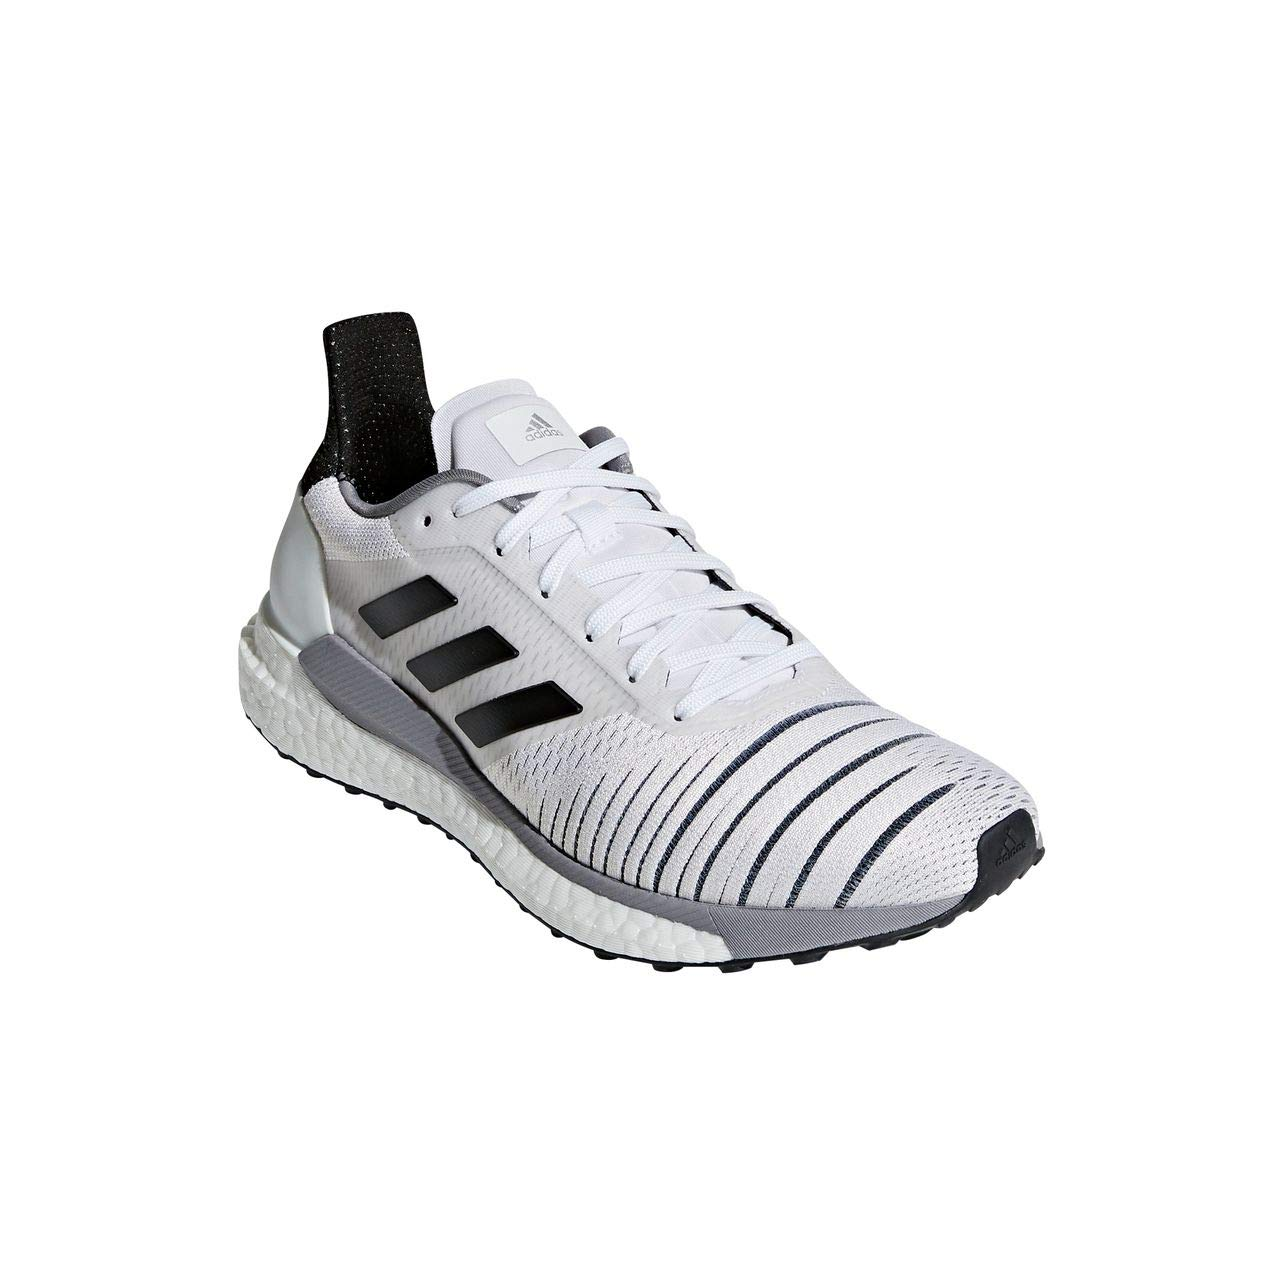 adidas Women's Solar Glide Training Shoes AQ0334